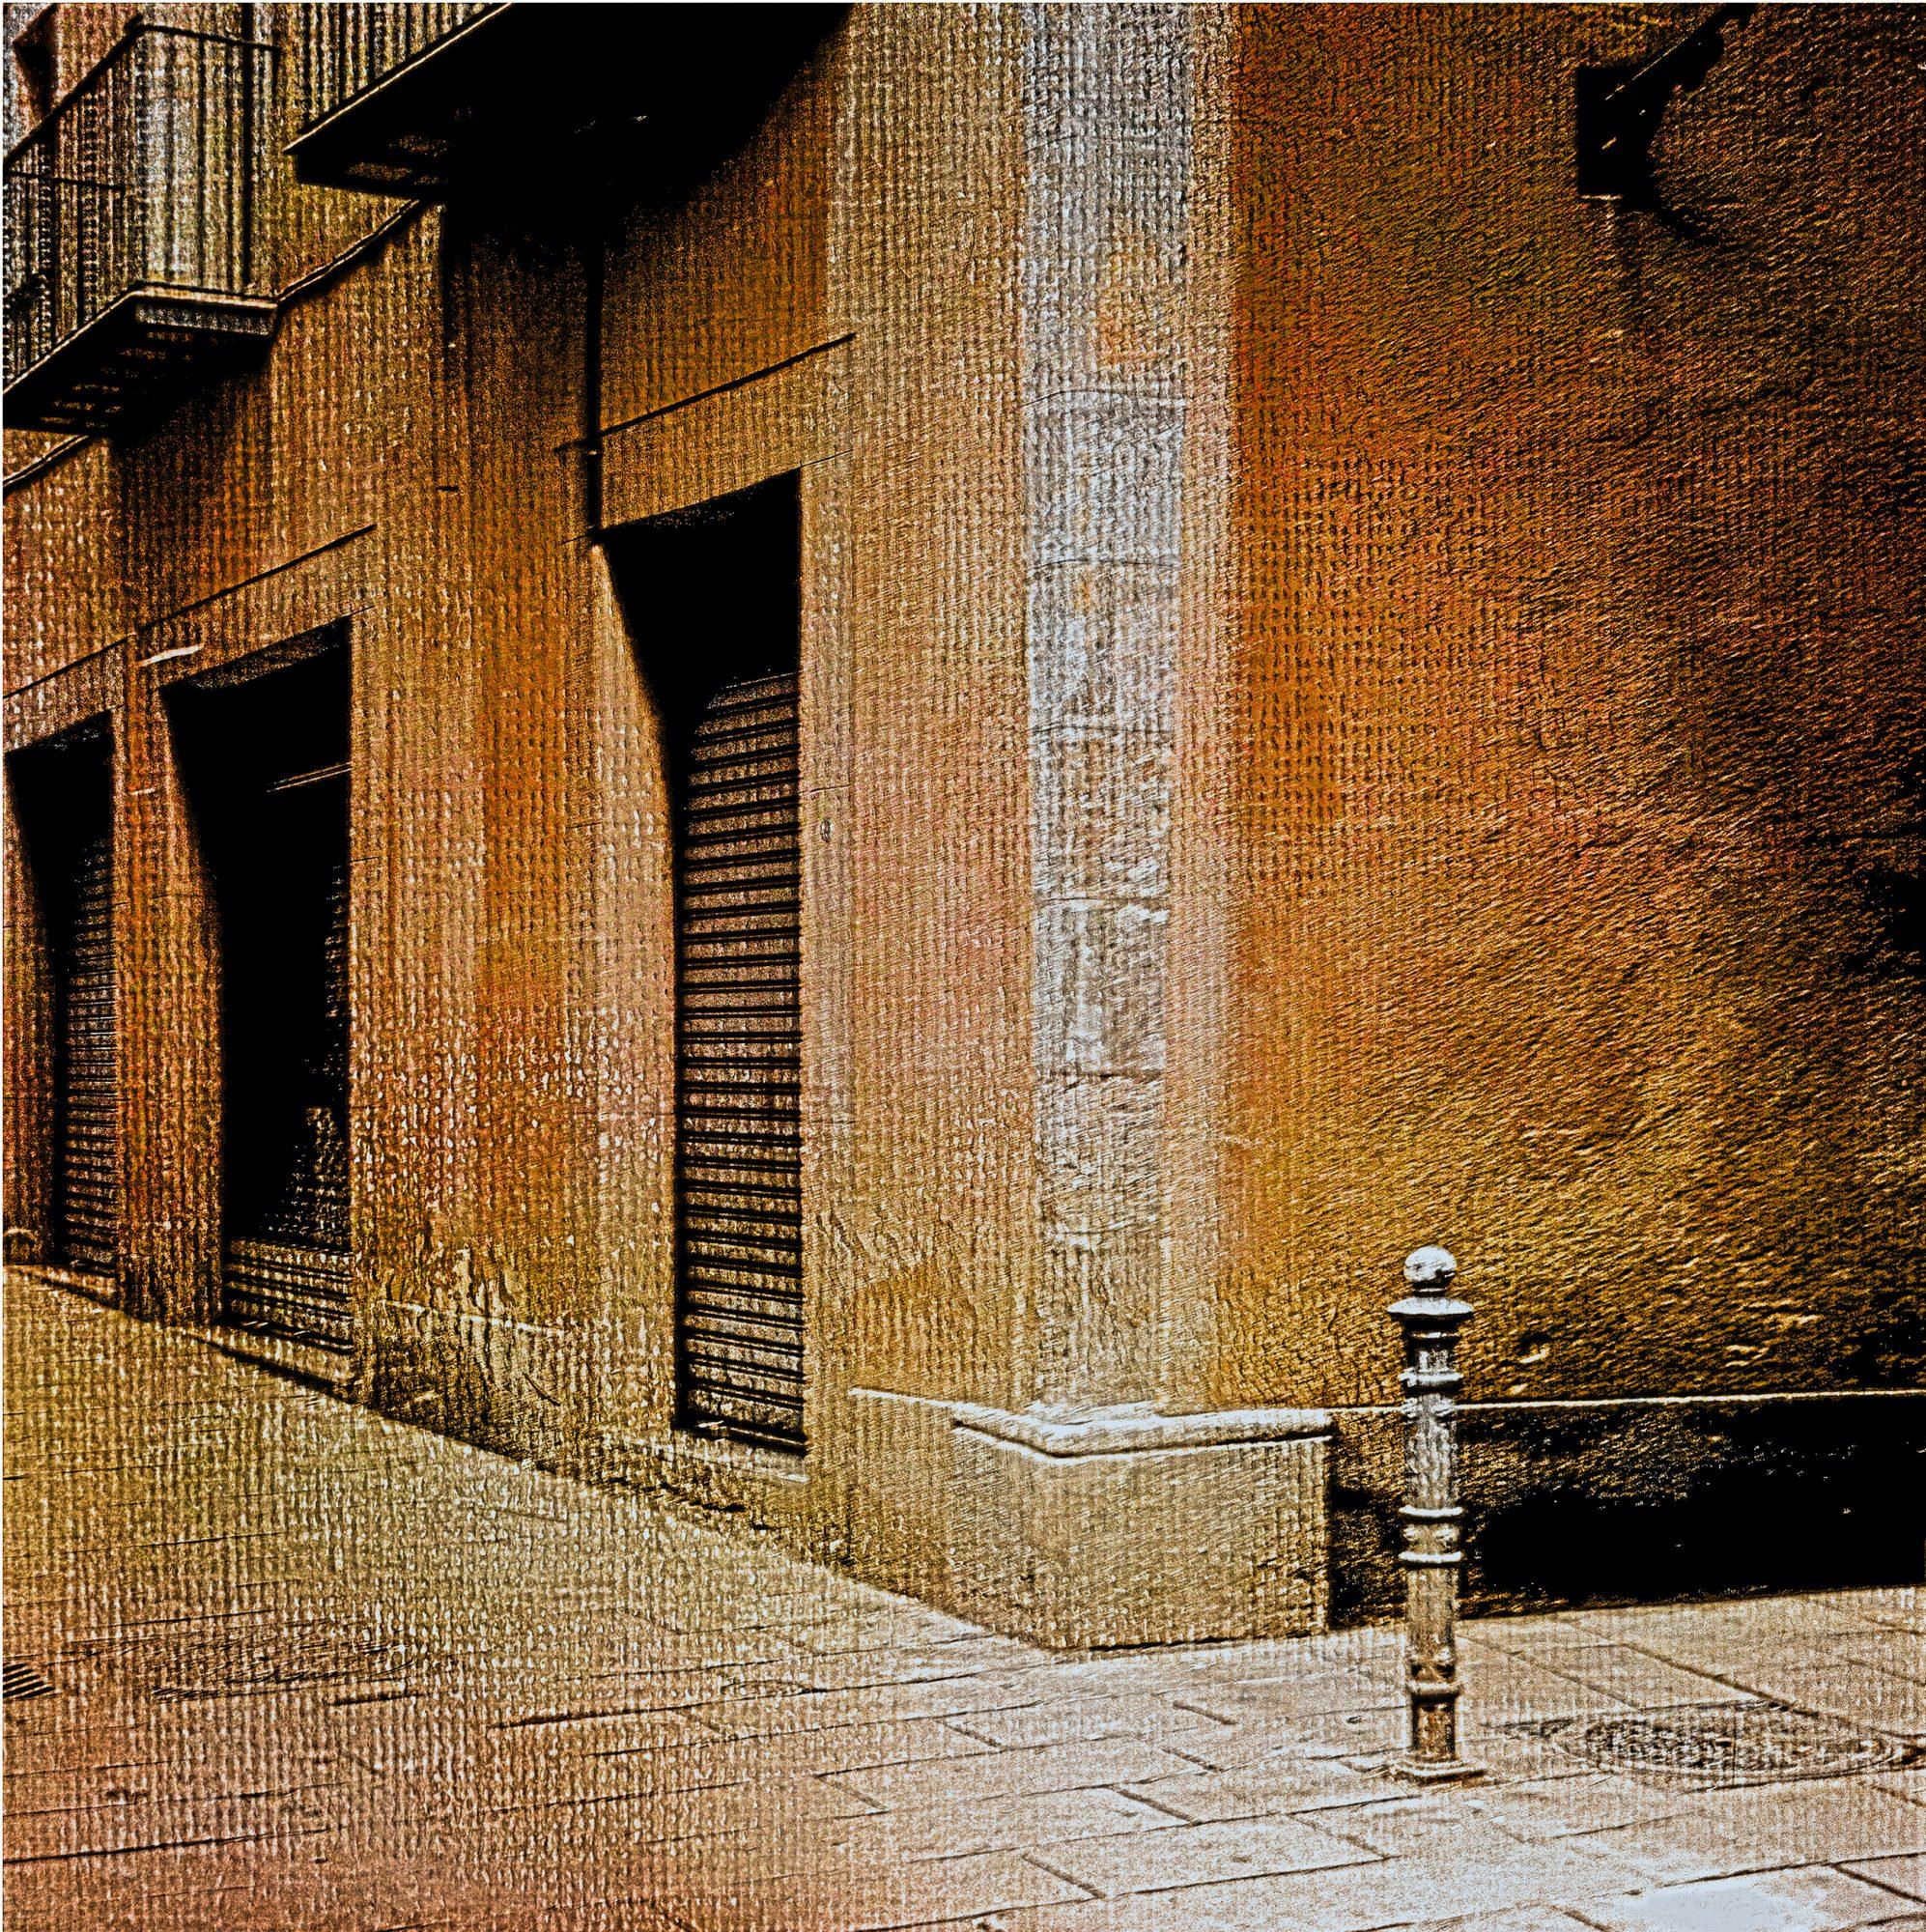 pcf0937sq-gothic-quarter-barcelona-reduced-art-pharmacy